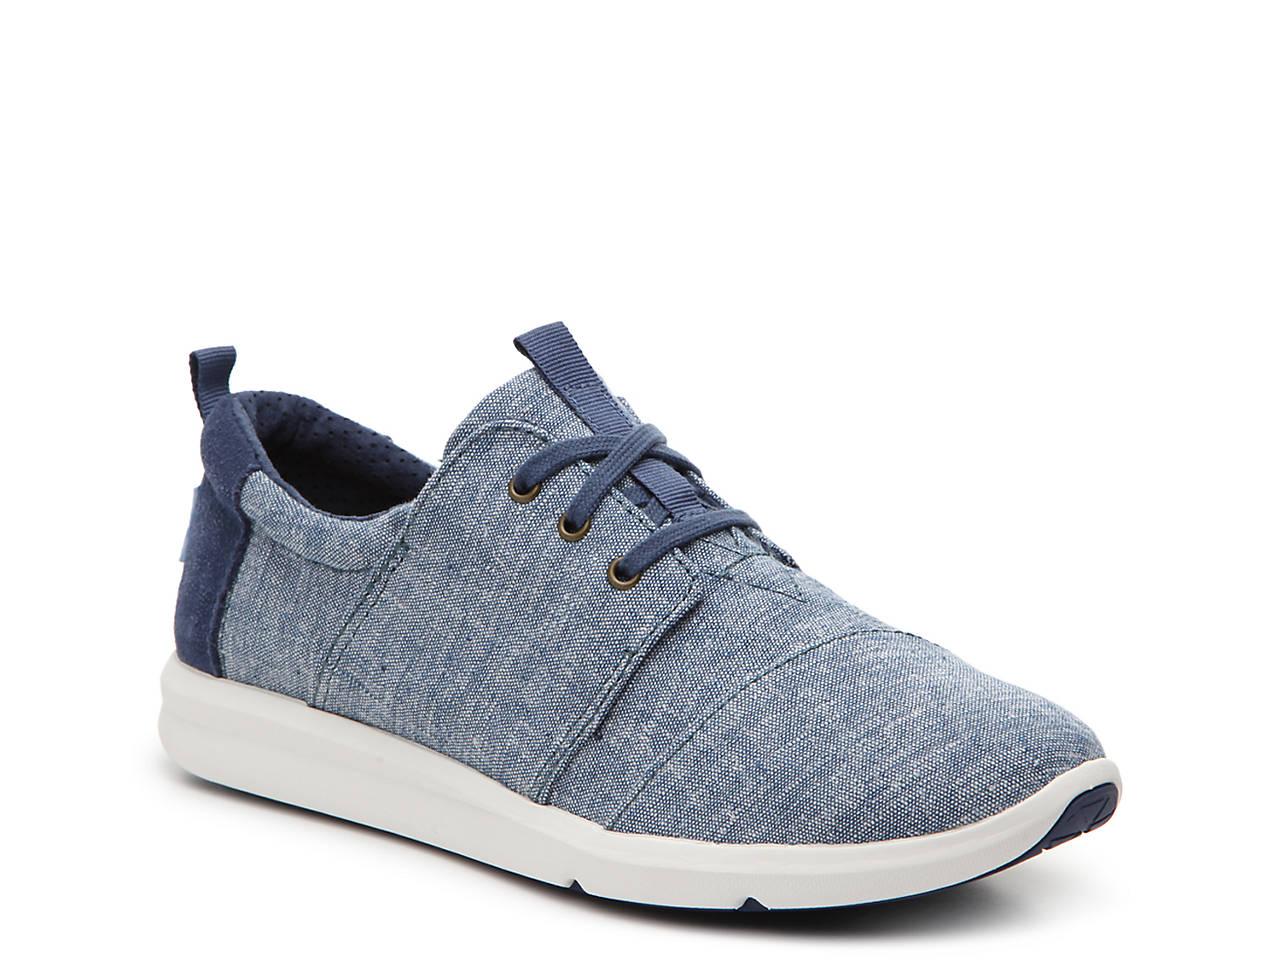 9b5f083b9c9 TOMS Del Ray Sneaker Women s Shoes